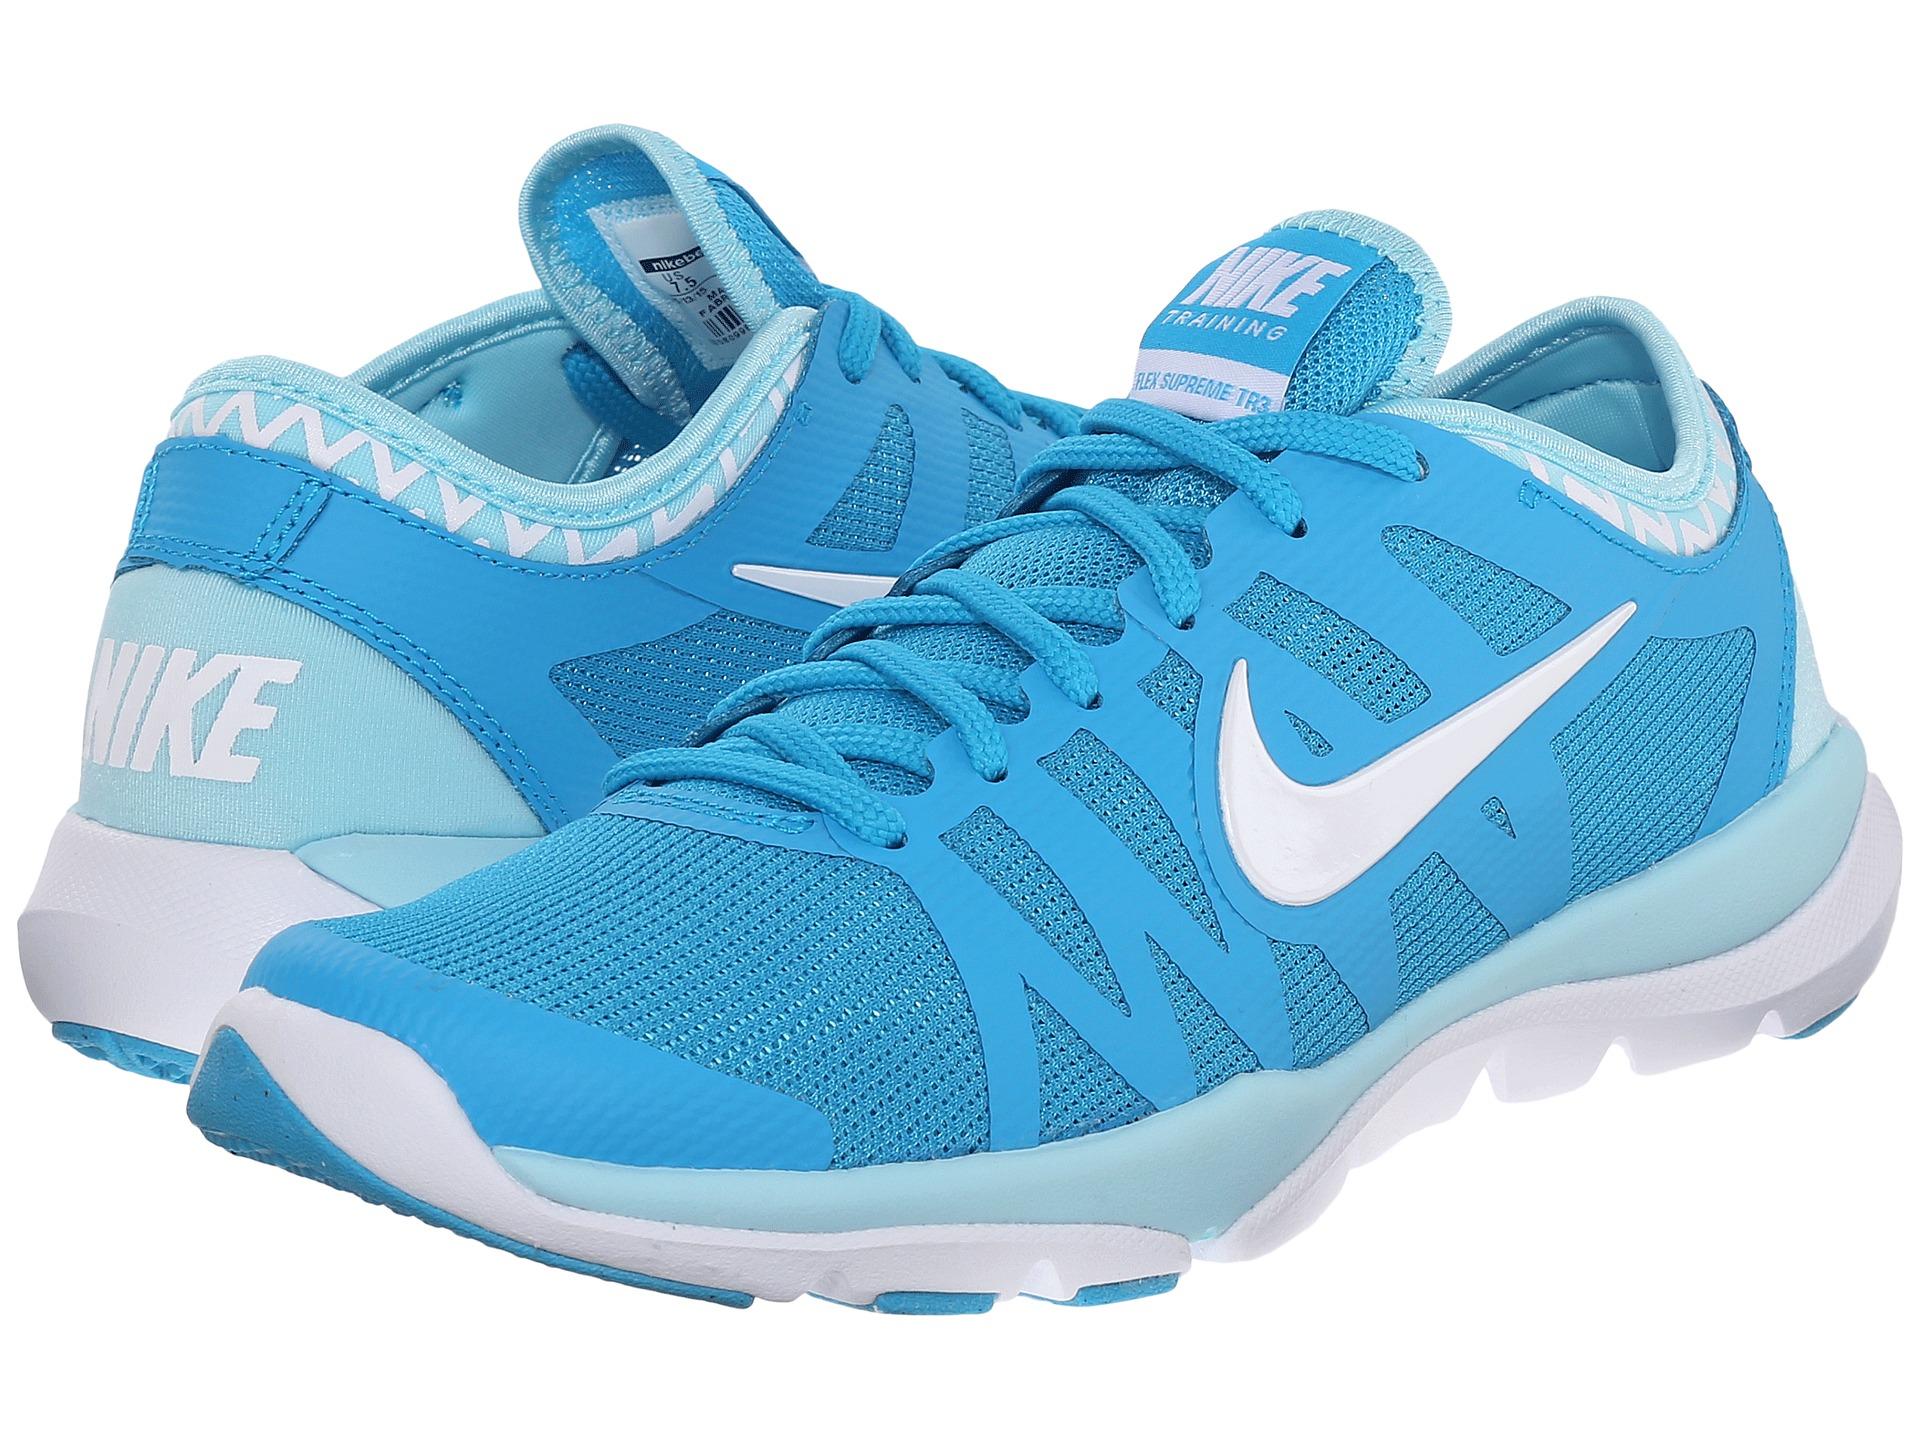 quality design 82938 8f6d9 Nike Flex Supreme Tr 3 in Blue for Men - Lyst